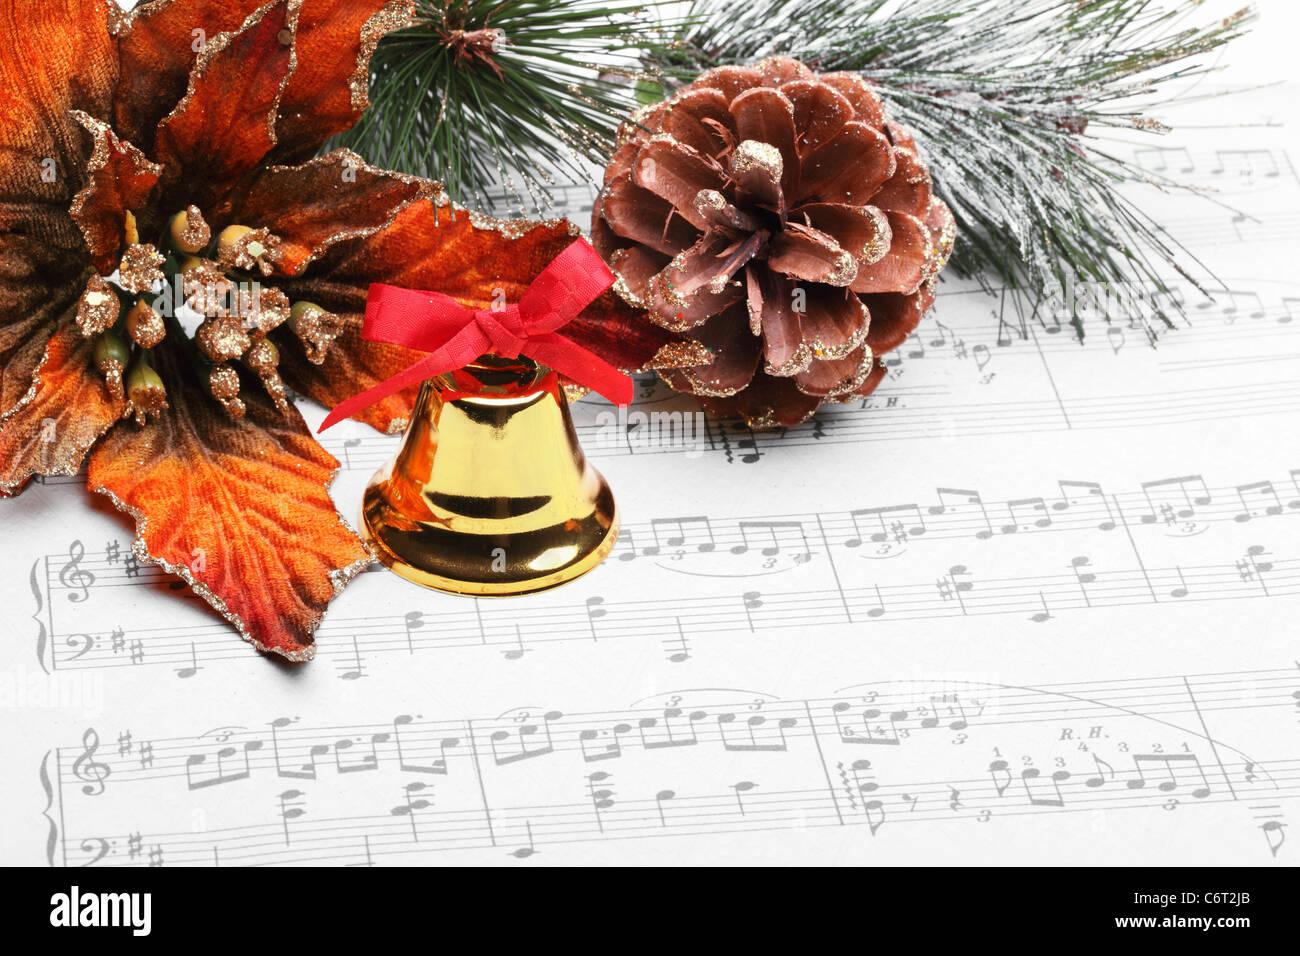 Christmas Ornaments and Sheet Music - Stock Image